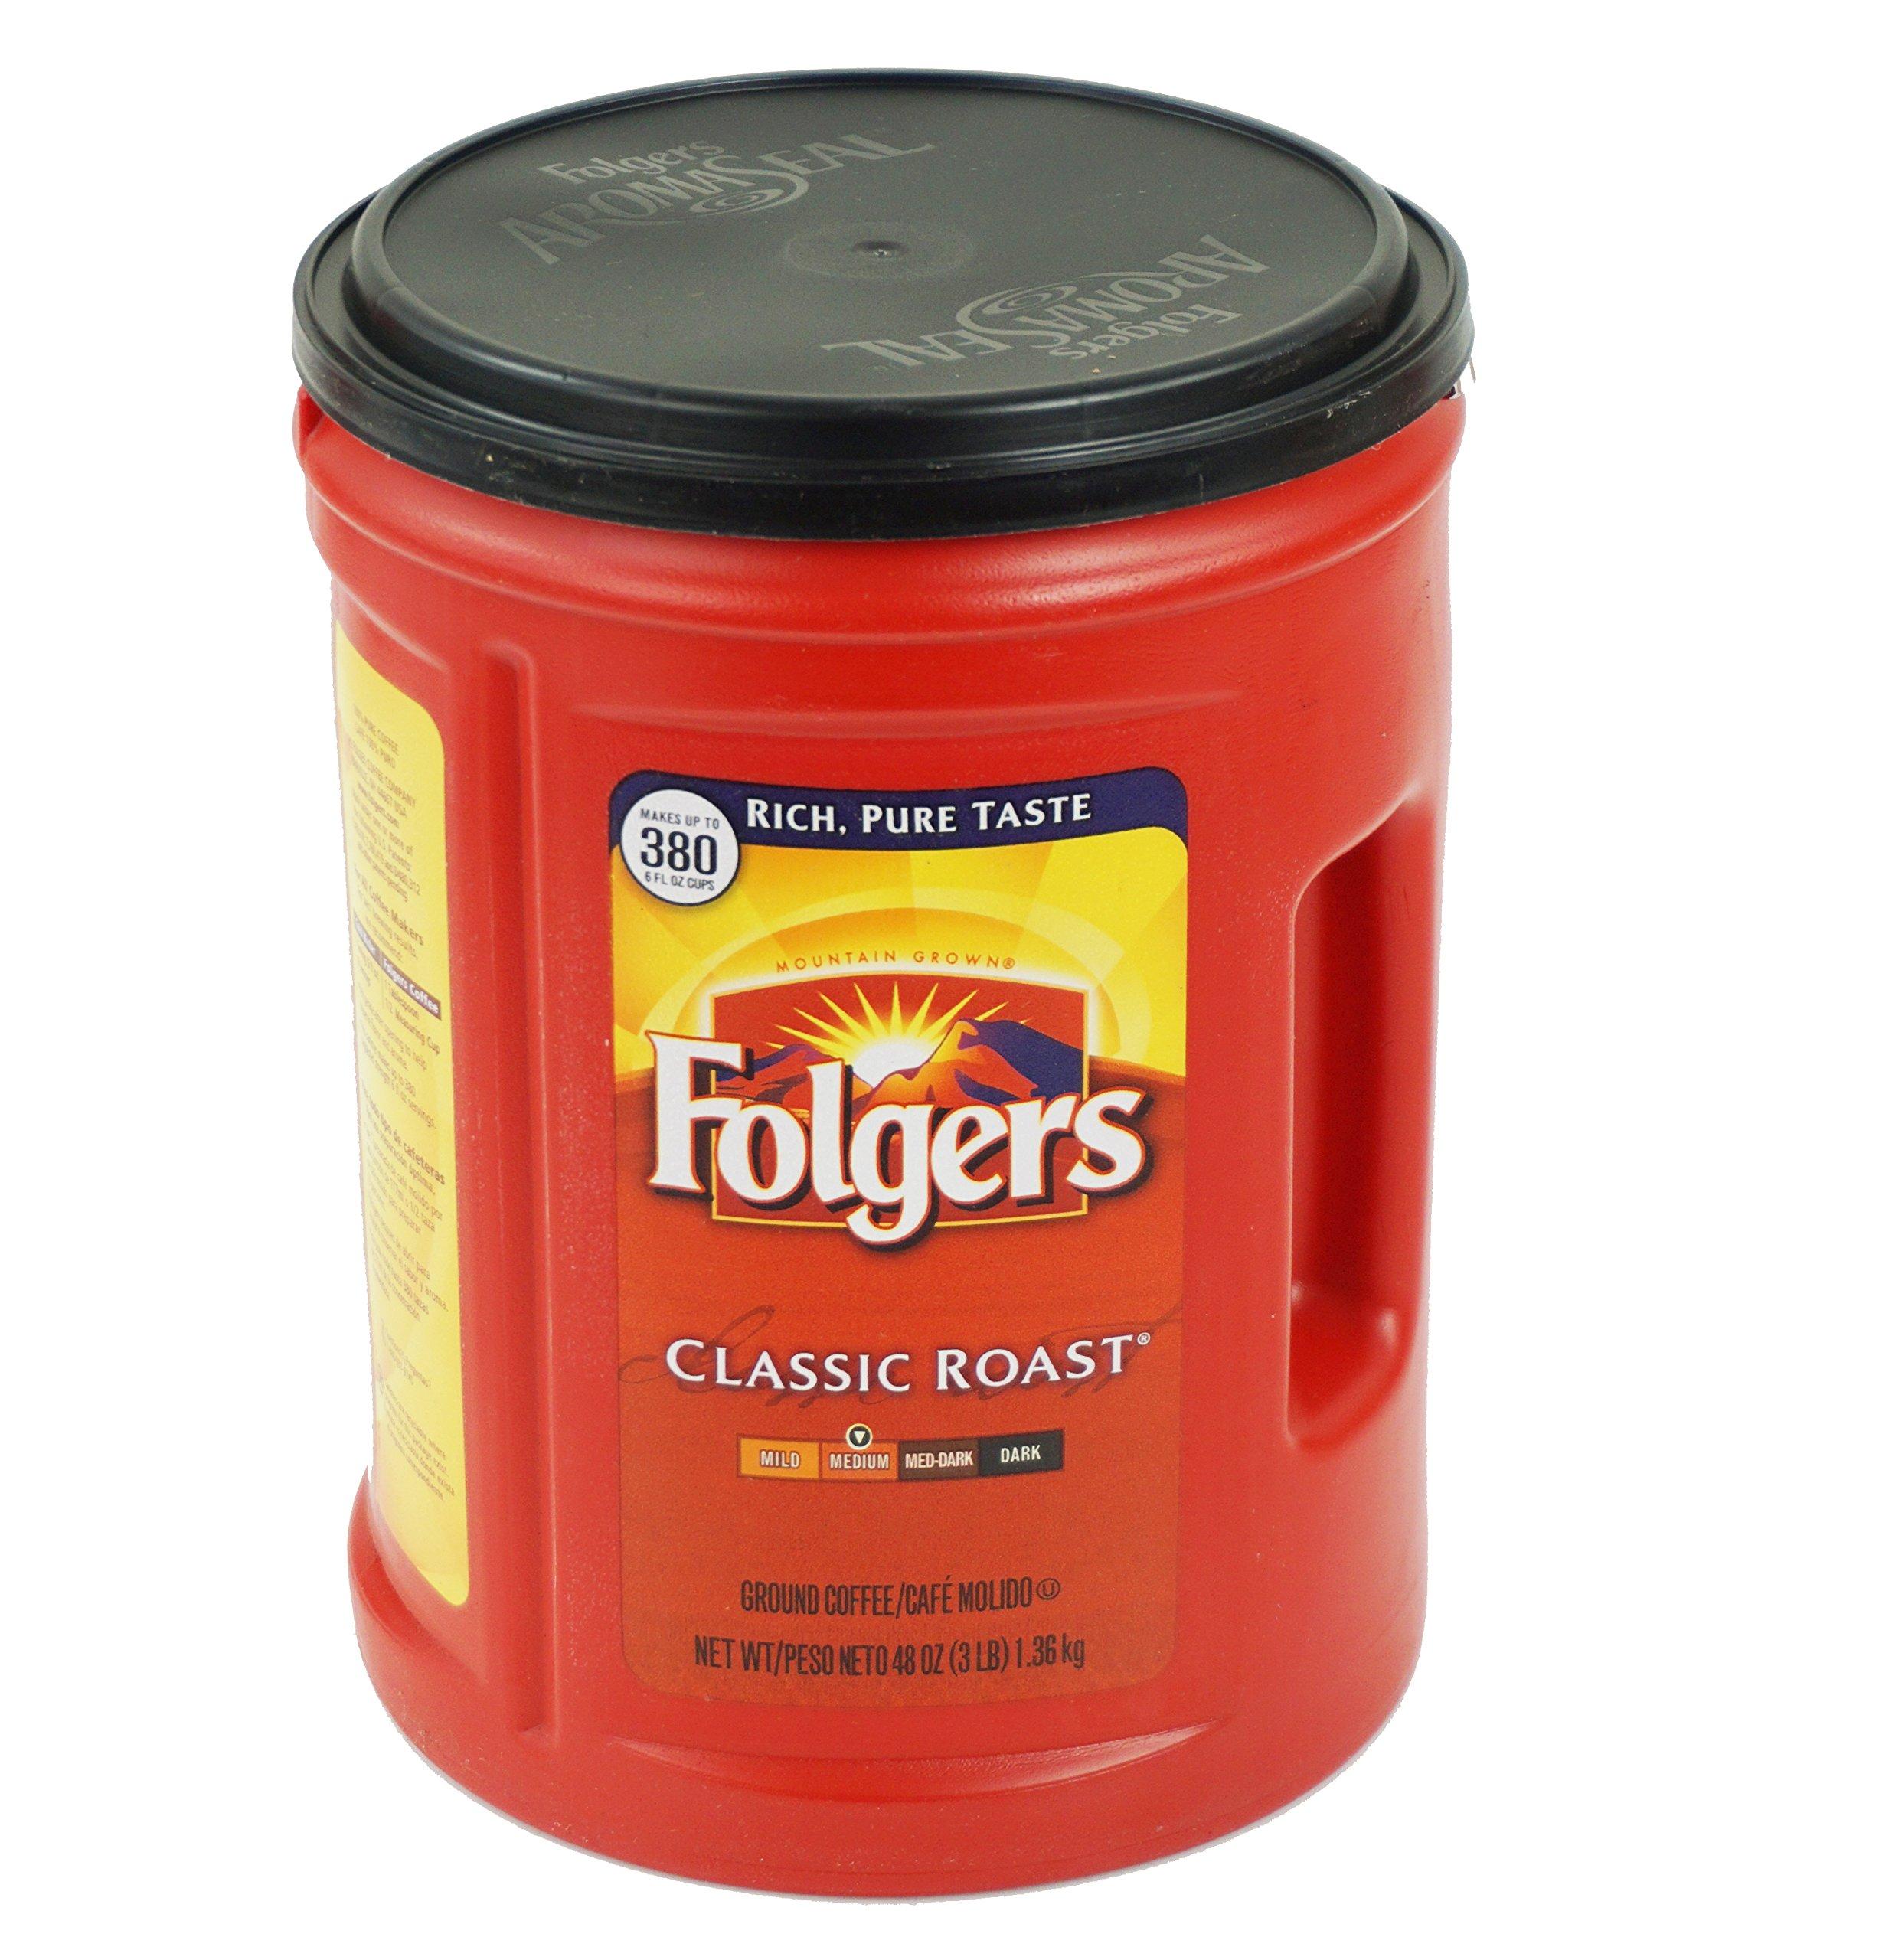 Fresh Taste of Folgers Coffee, Classic Roast Ground Coffee, Medium Flavor, 48 Oz Canister - (1 pk)